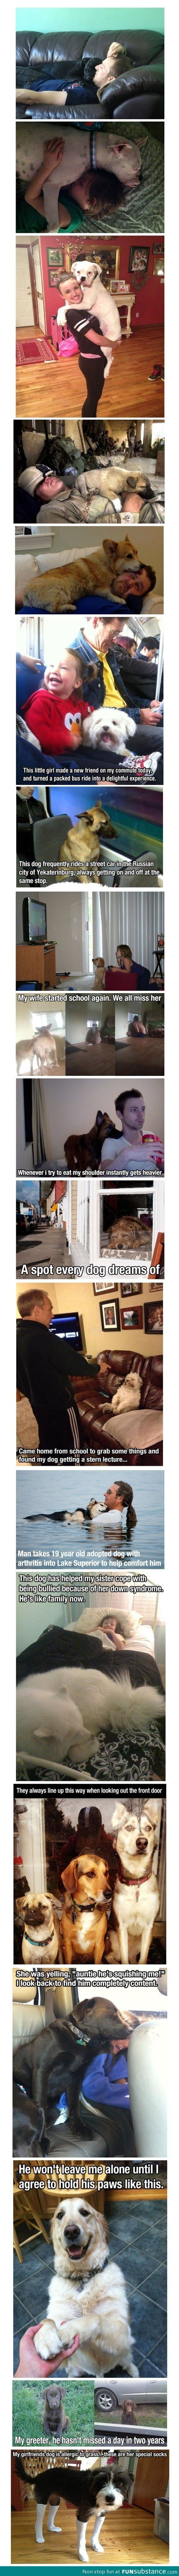 Omg. I love dogs!